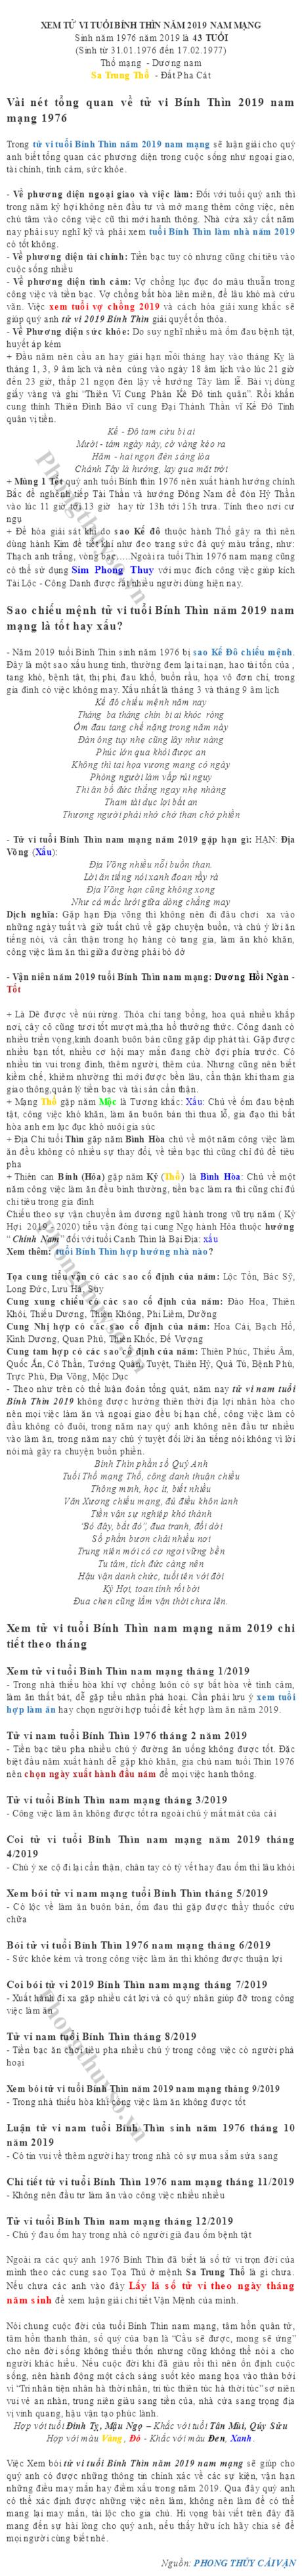 tu-vi-tuoi-binh-thin-nam-2019-nam-mang